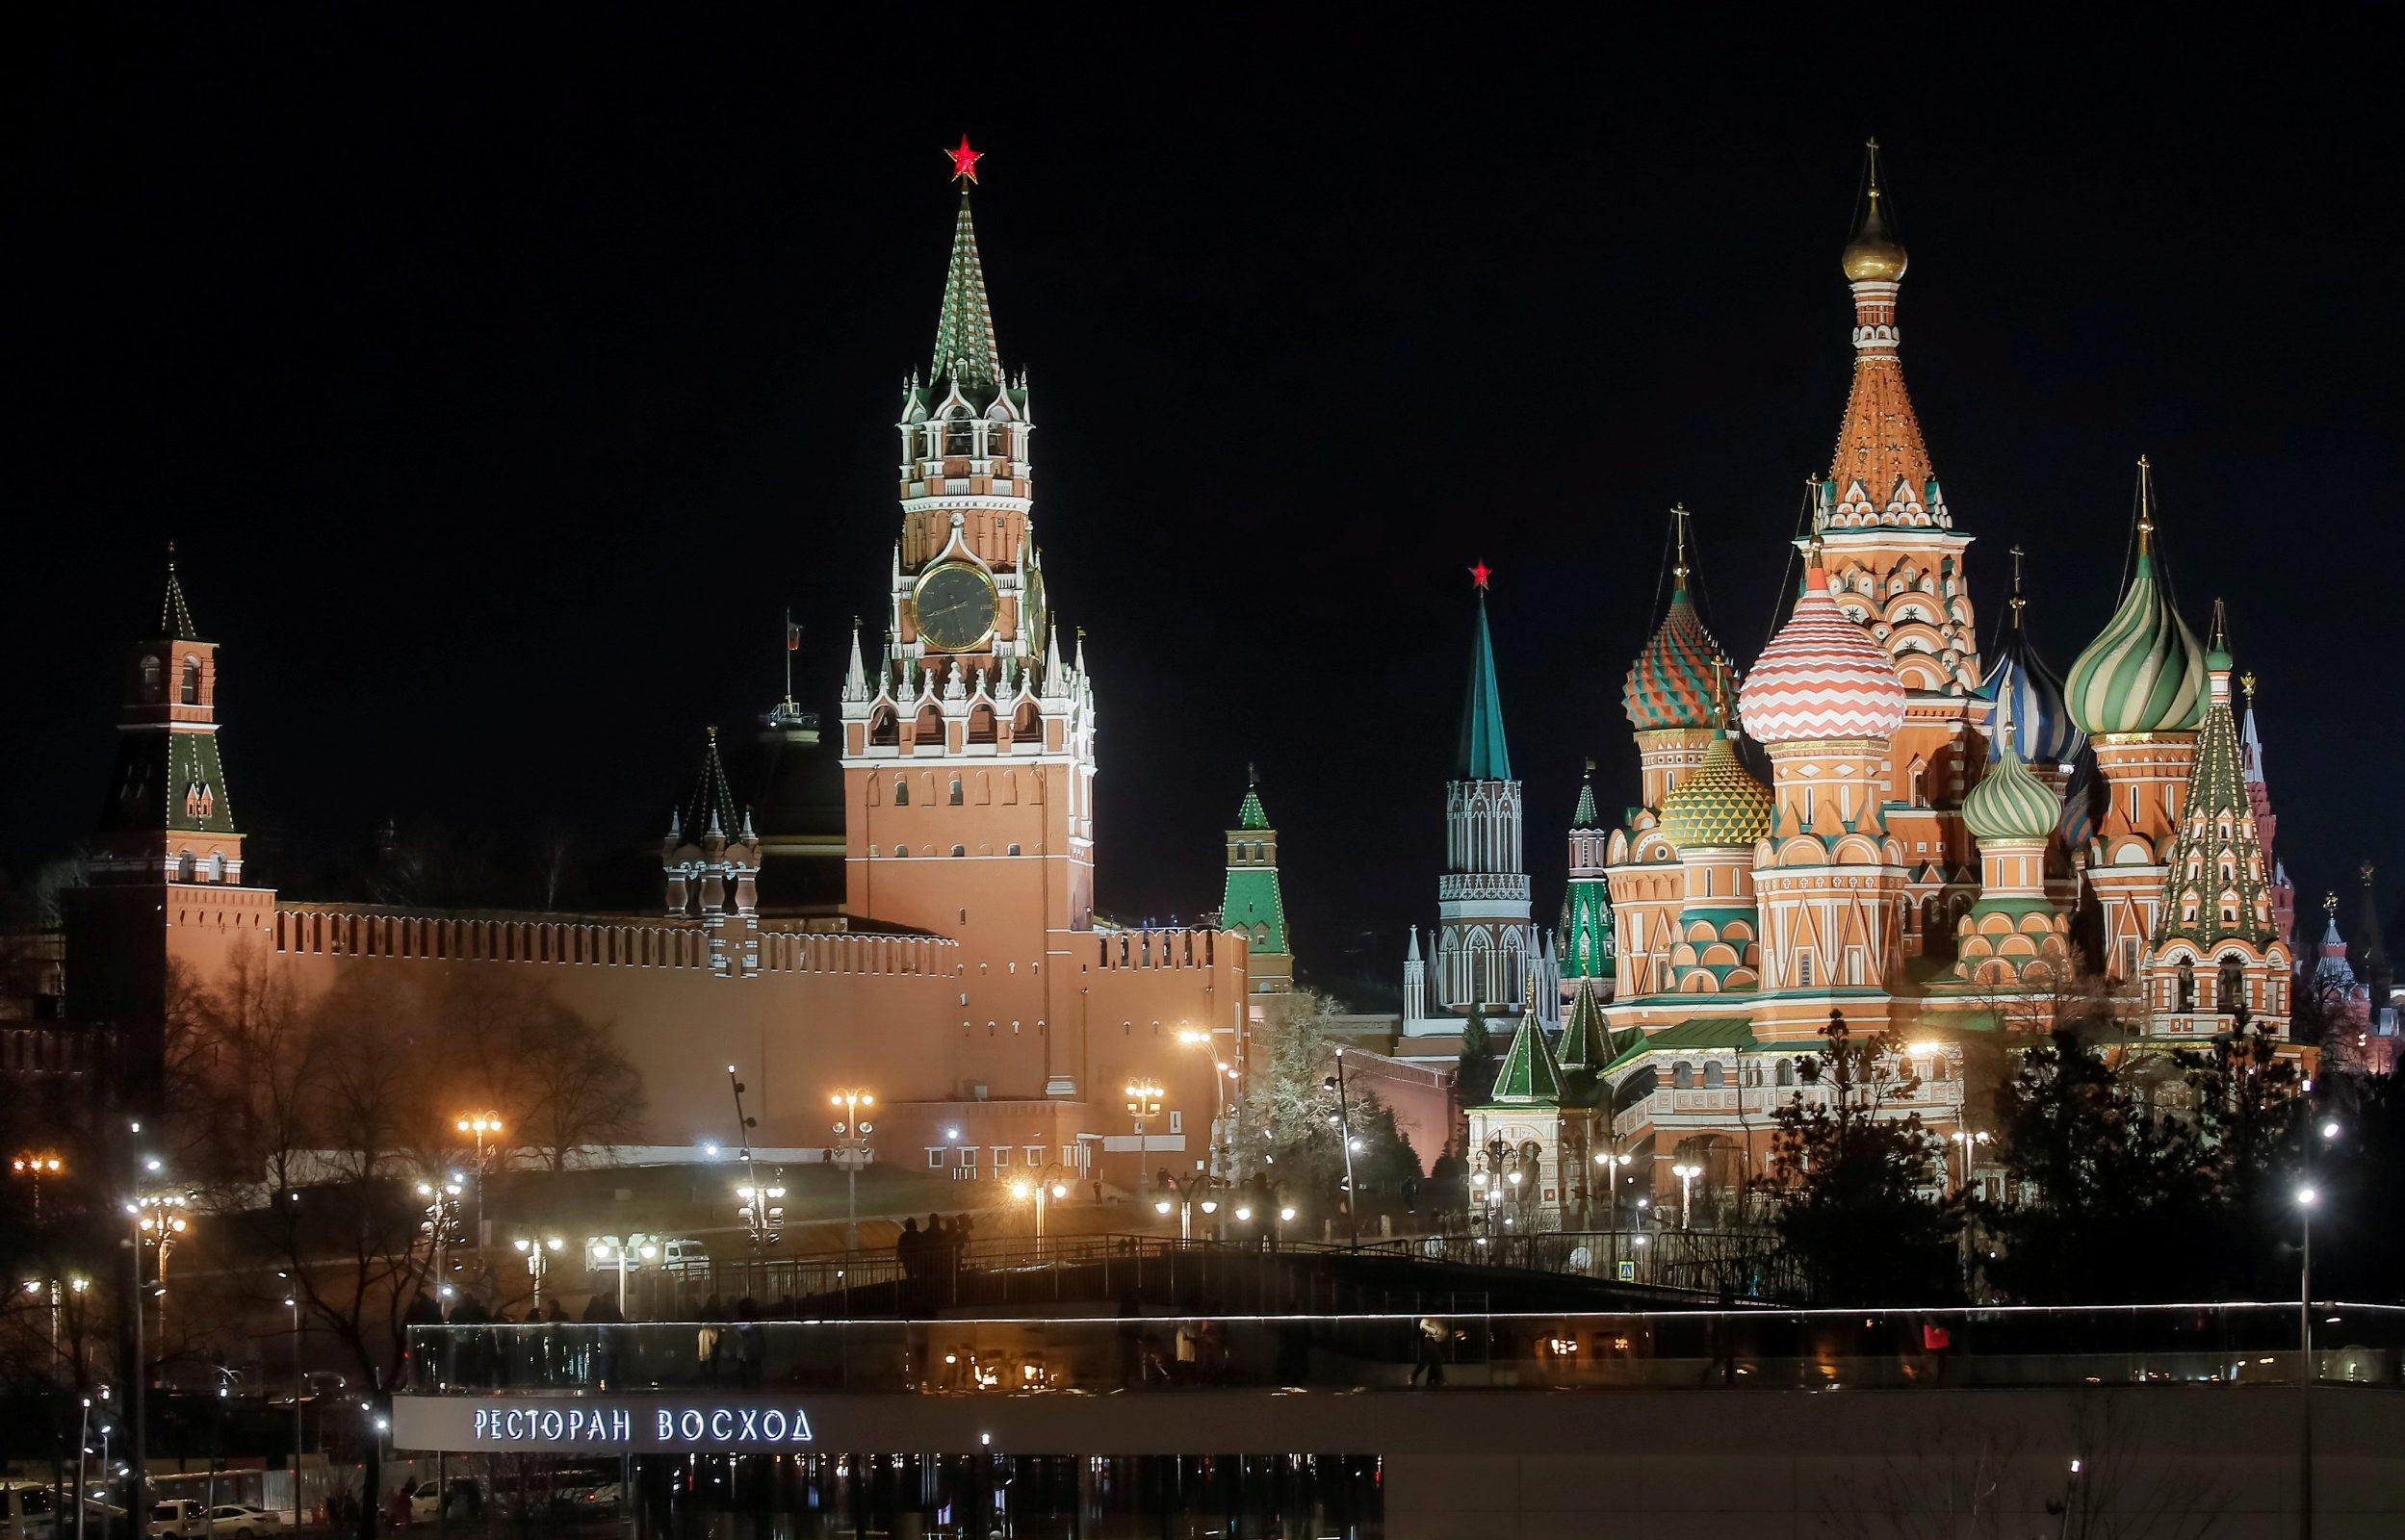 2019-06-10T062123Z_1100056226_RC1B8364B4A0_RTRMADP_3_RUSSIA-USA-BANKER